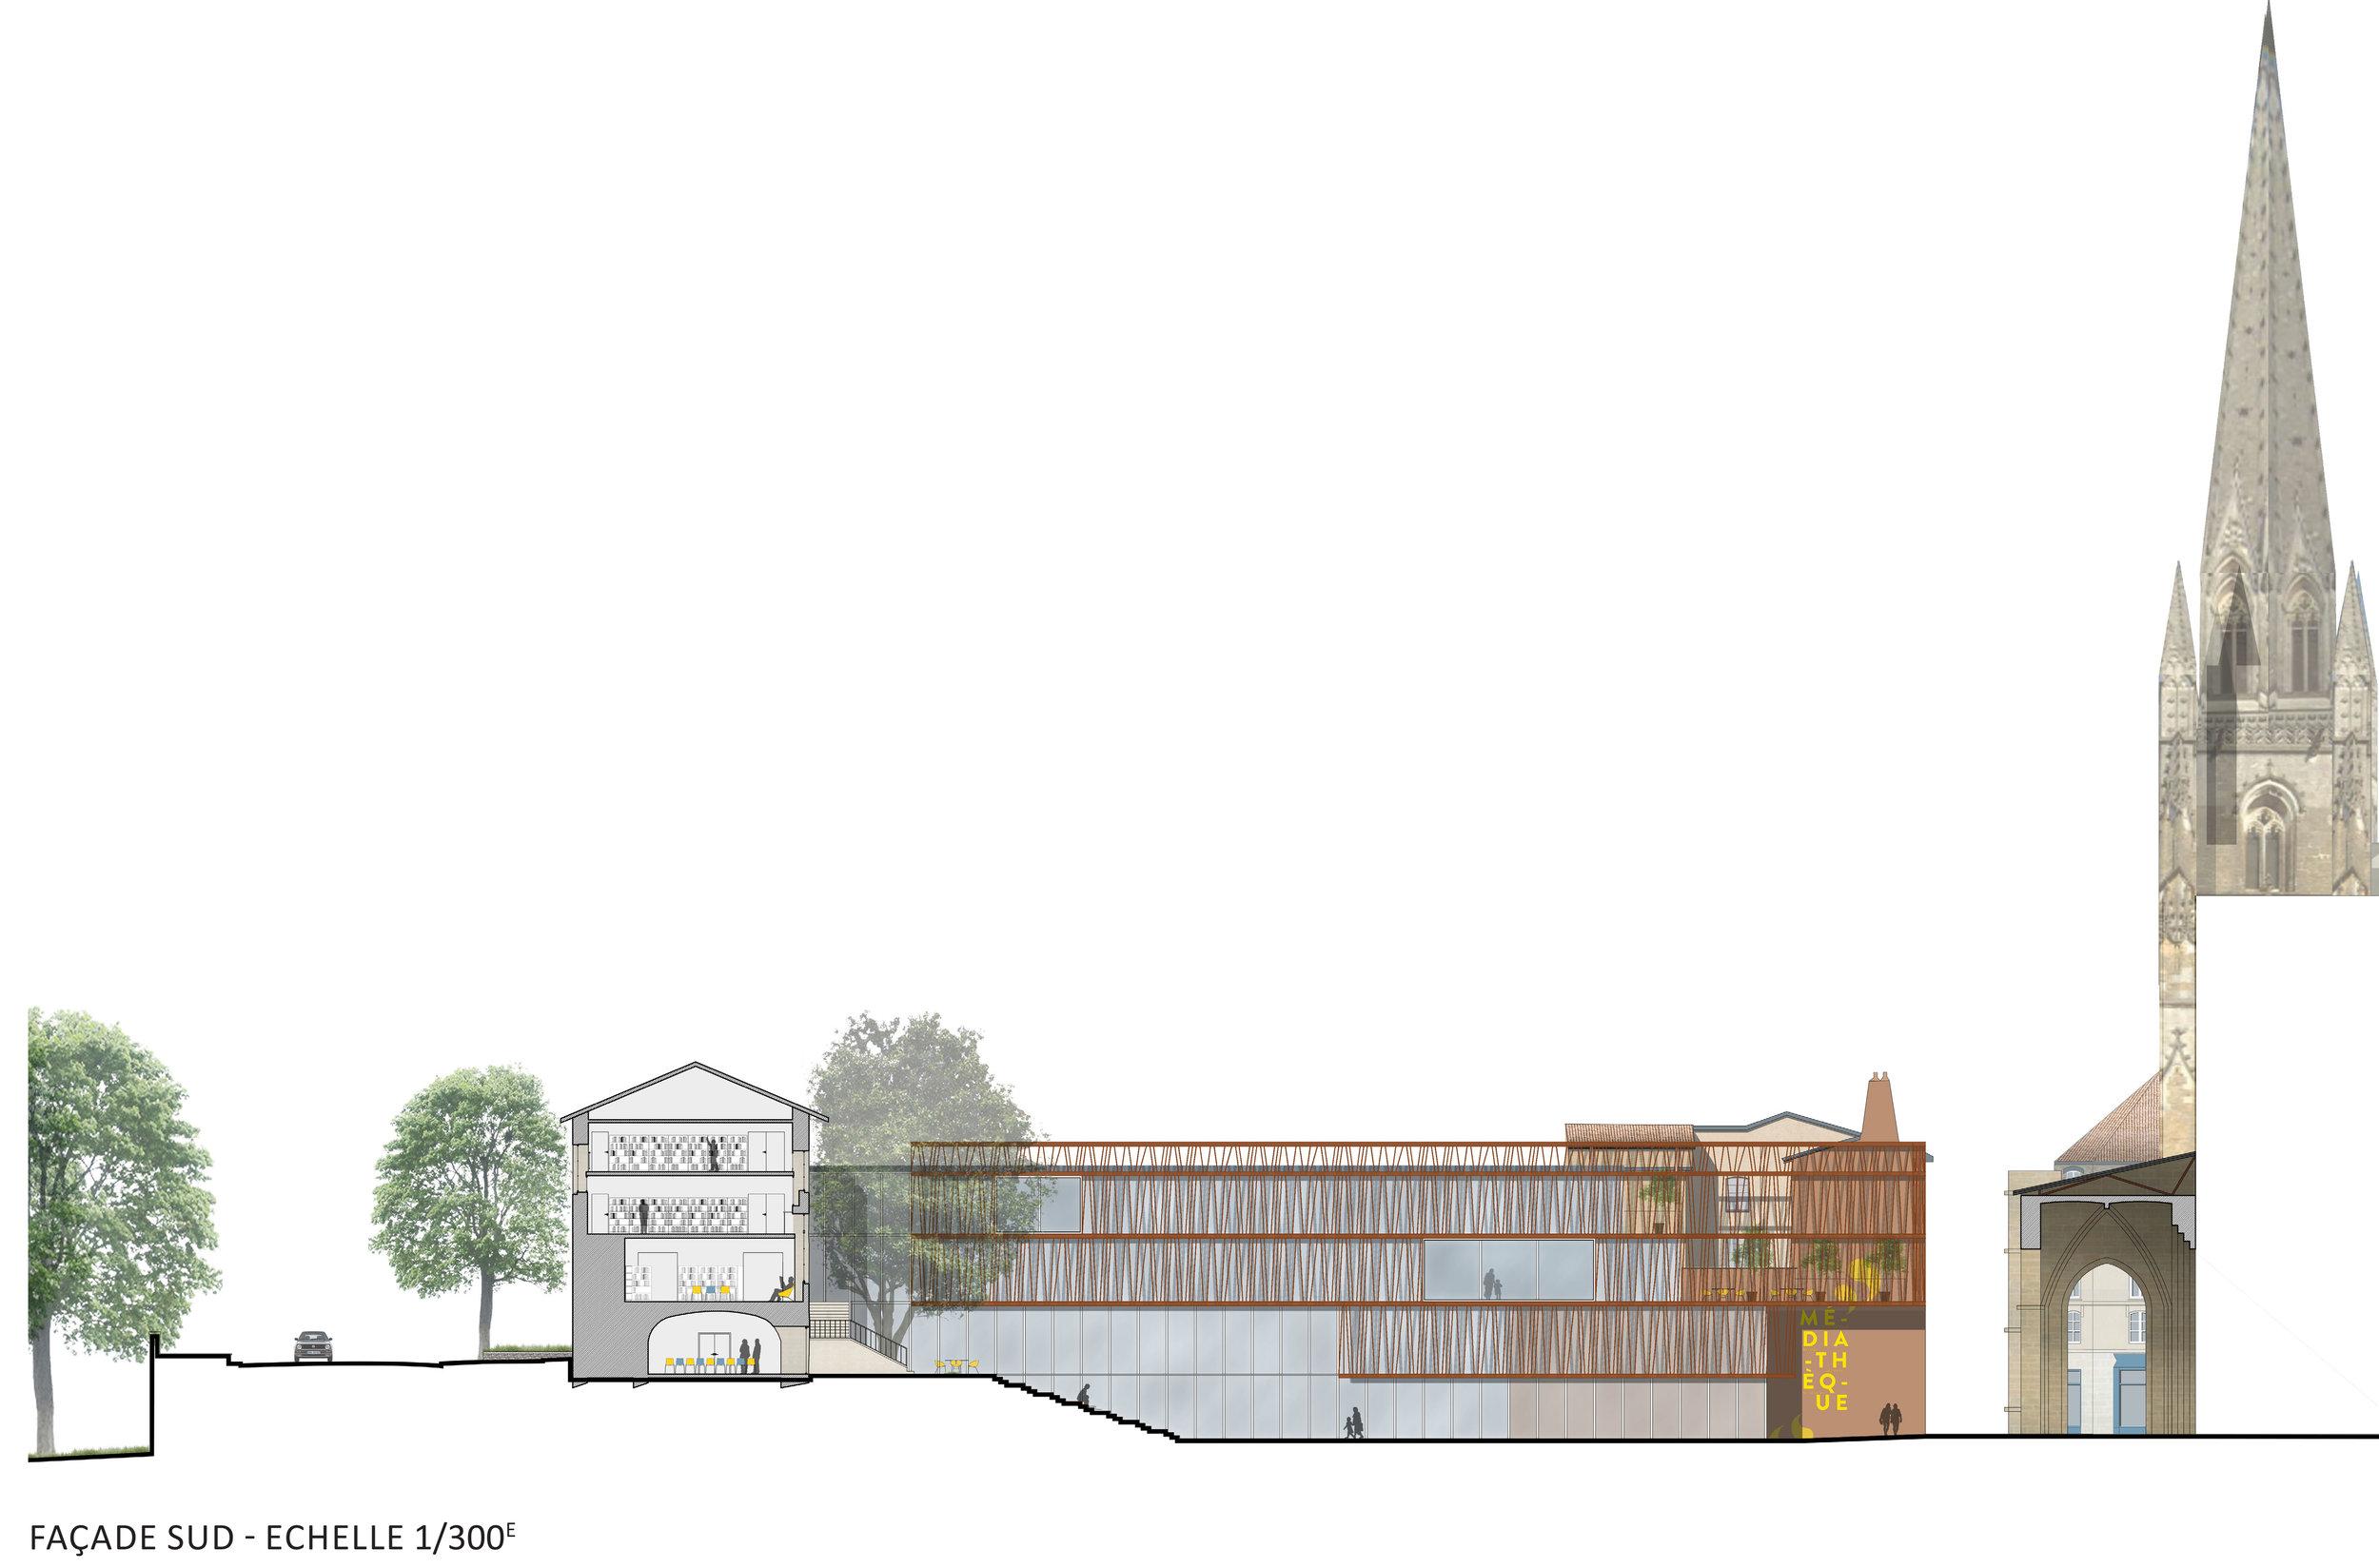 médiathèque_bayonne_public_outdoor_design_christophe_gautrand_paysagiste_5.jpg